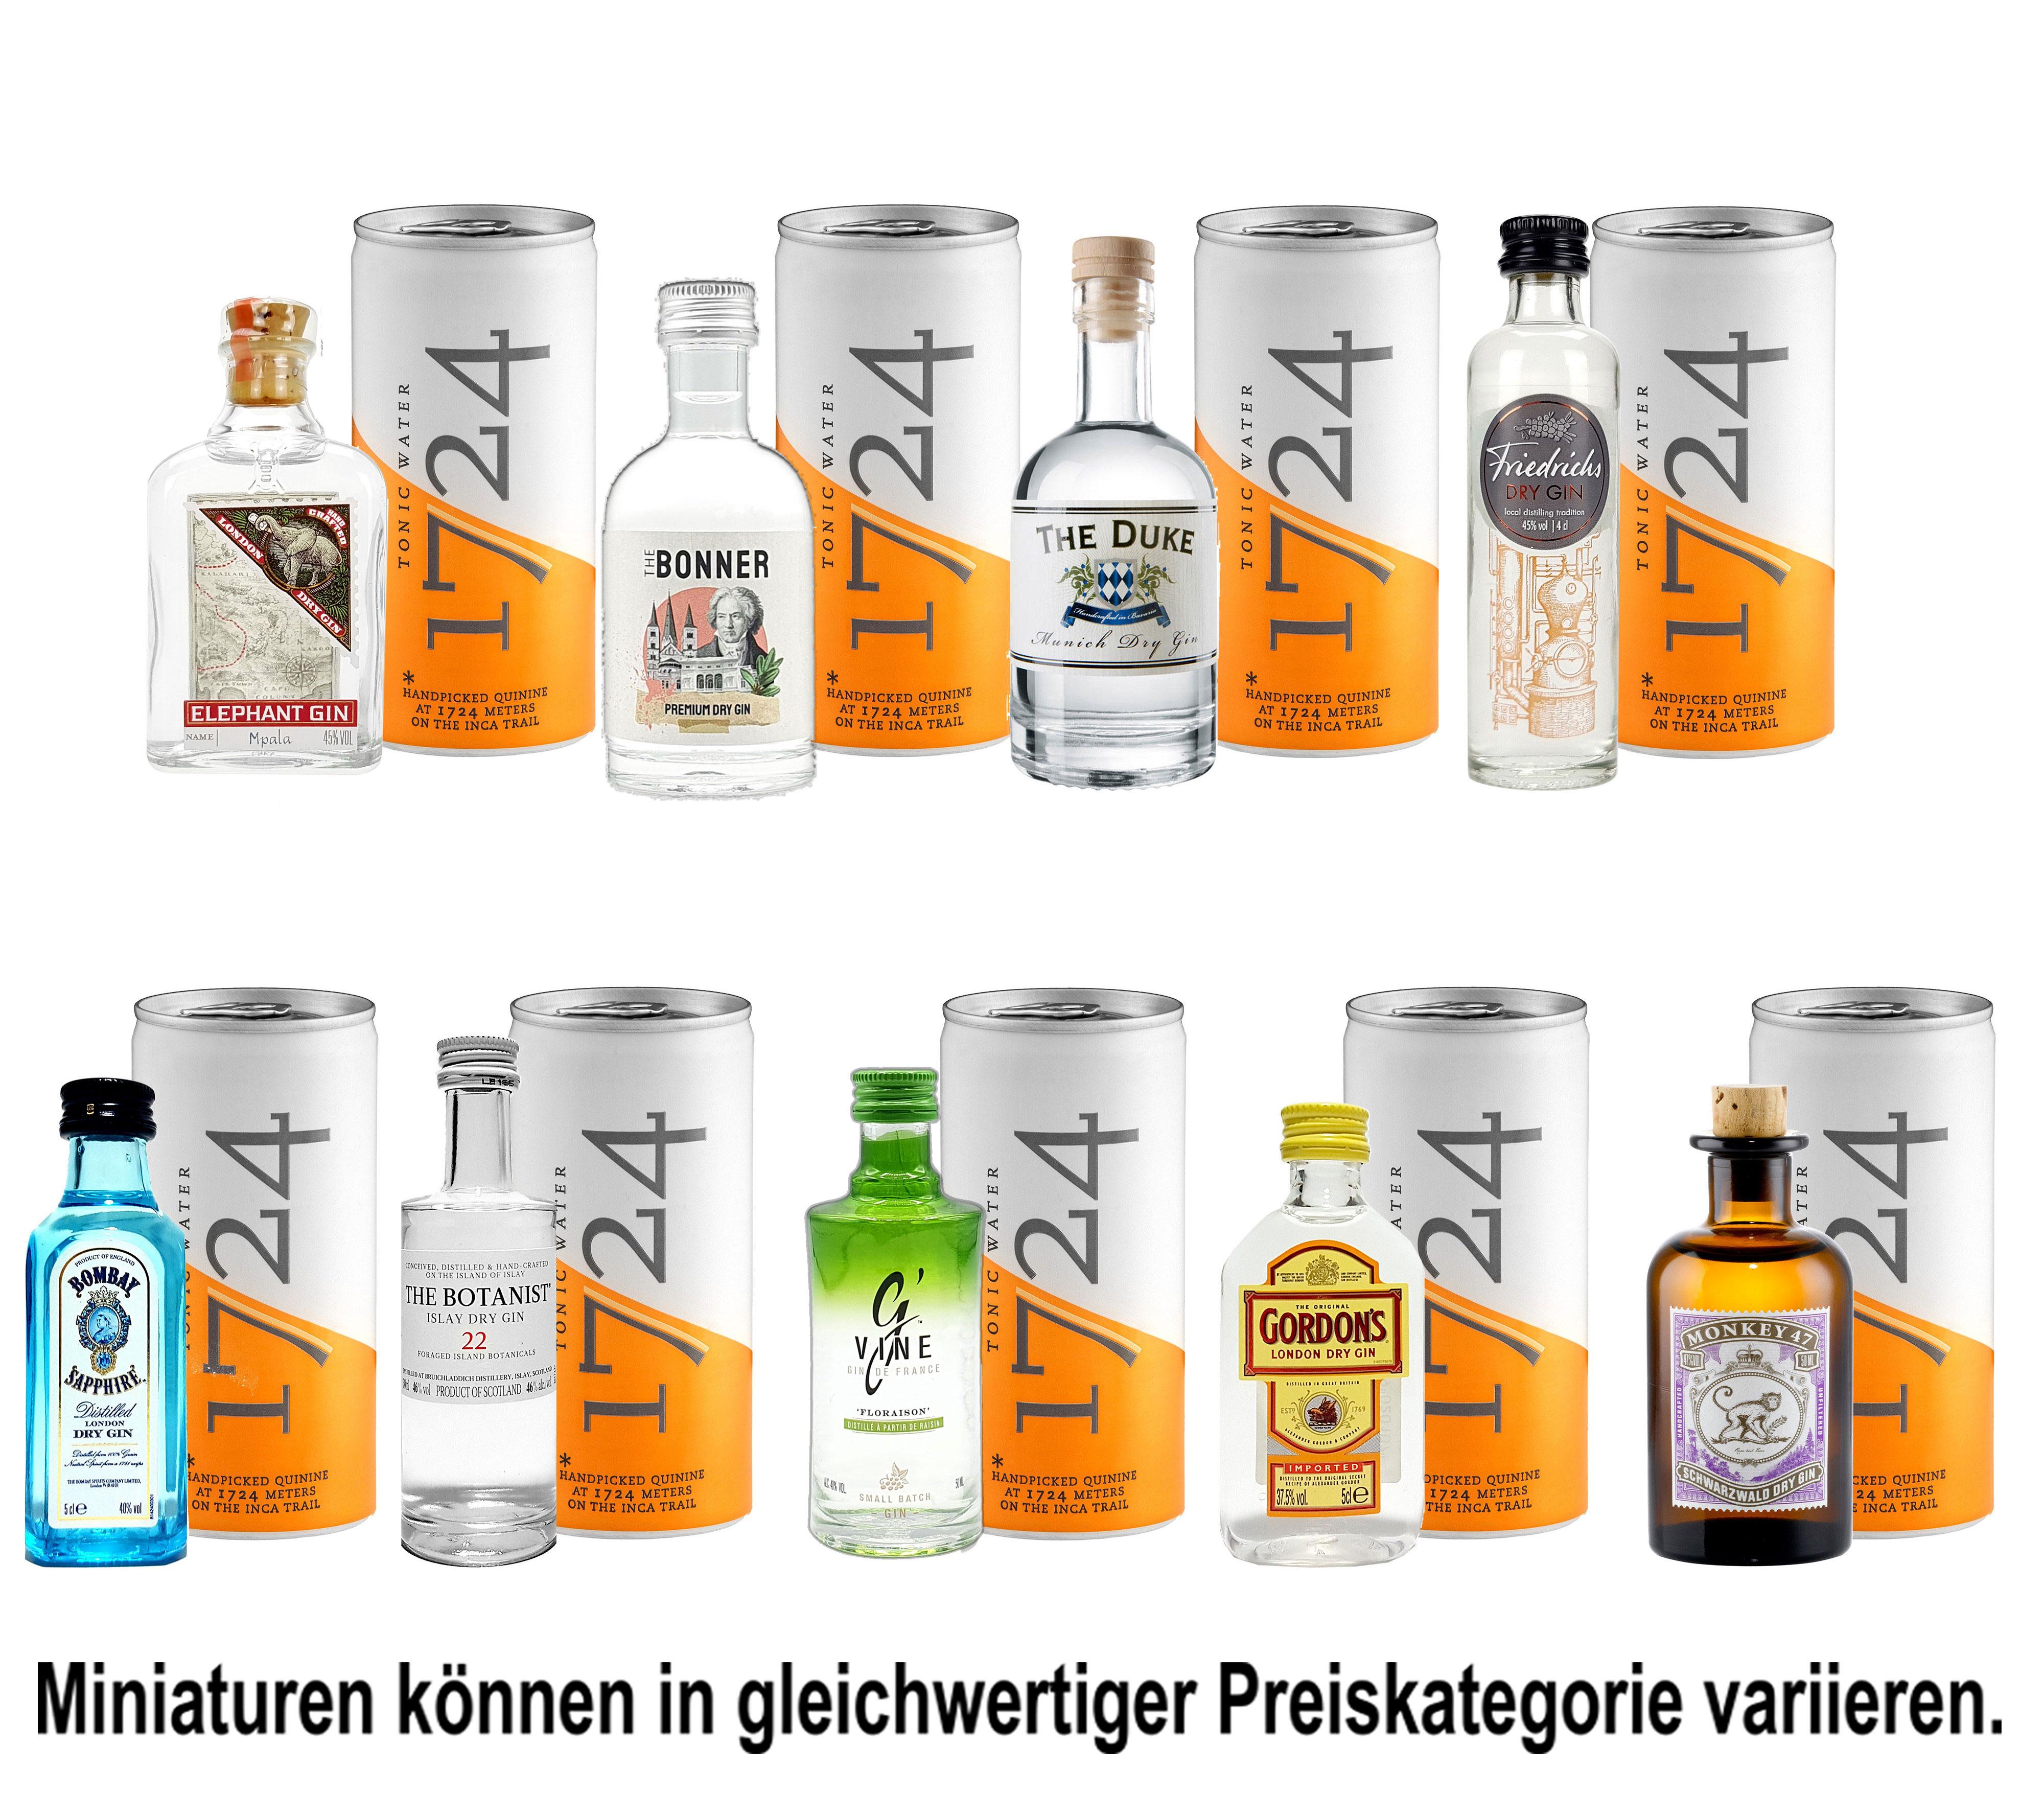 Mini Gin Tonic Probierset - 9 verschiedene Gin Sorten + 9x 1724 Tonic Water 200ml inkl. Pfand MEHRWEG - NEU